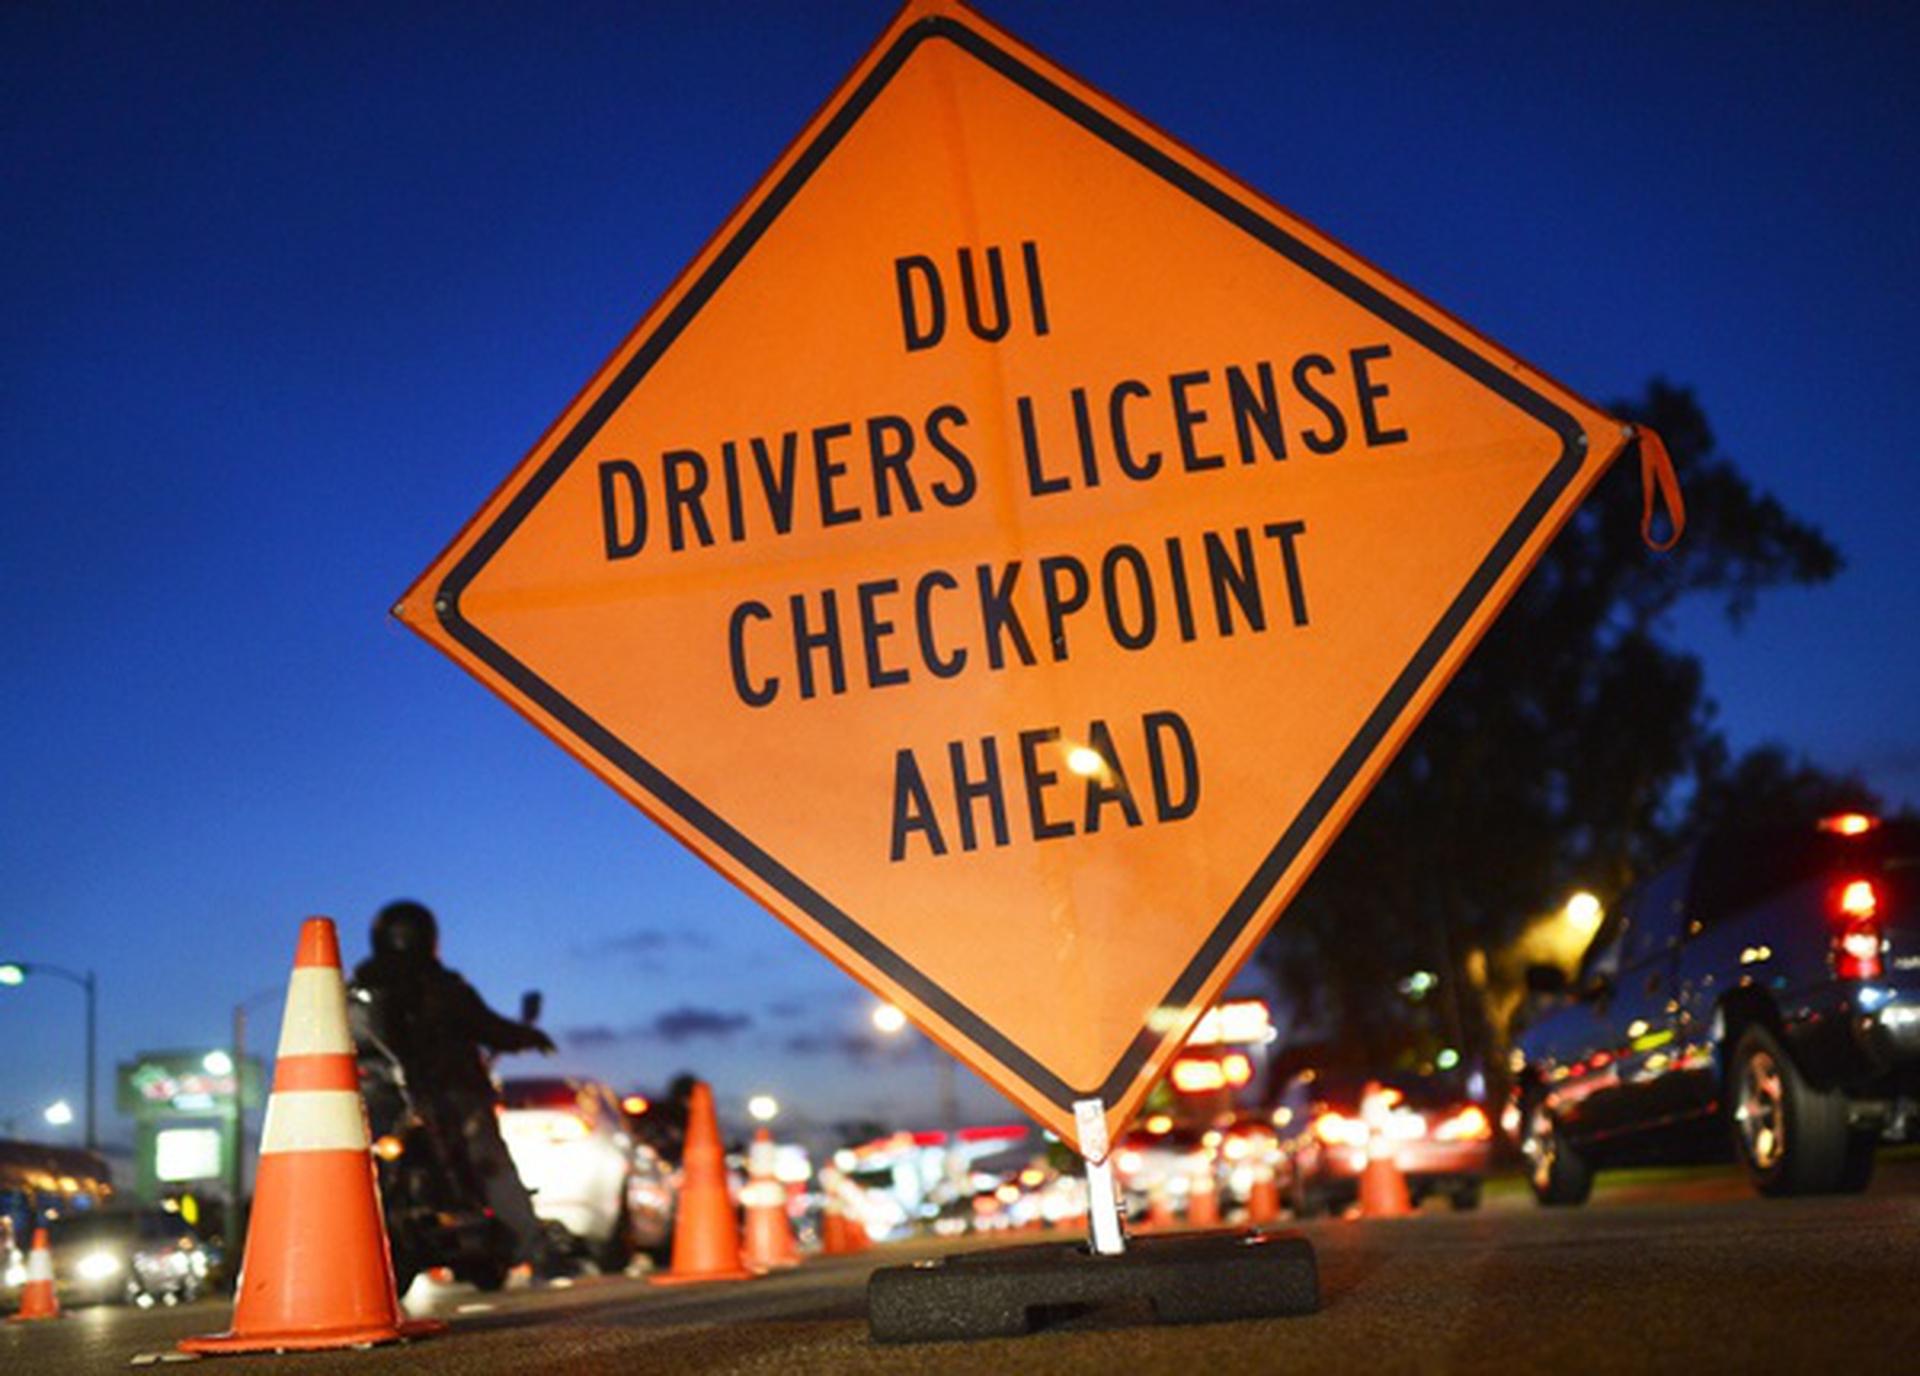 DUI & DWI Driving Impairment Checkpoint